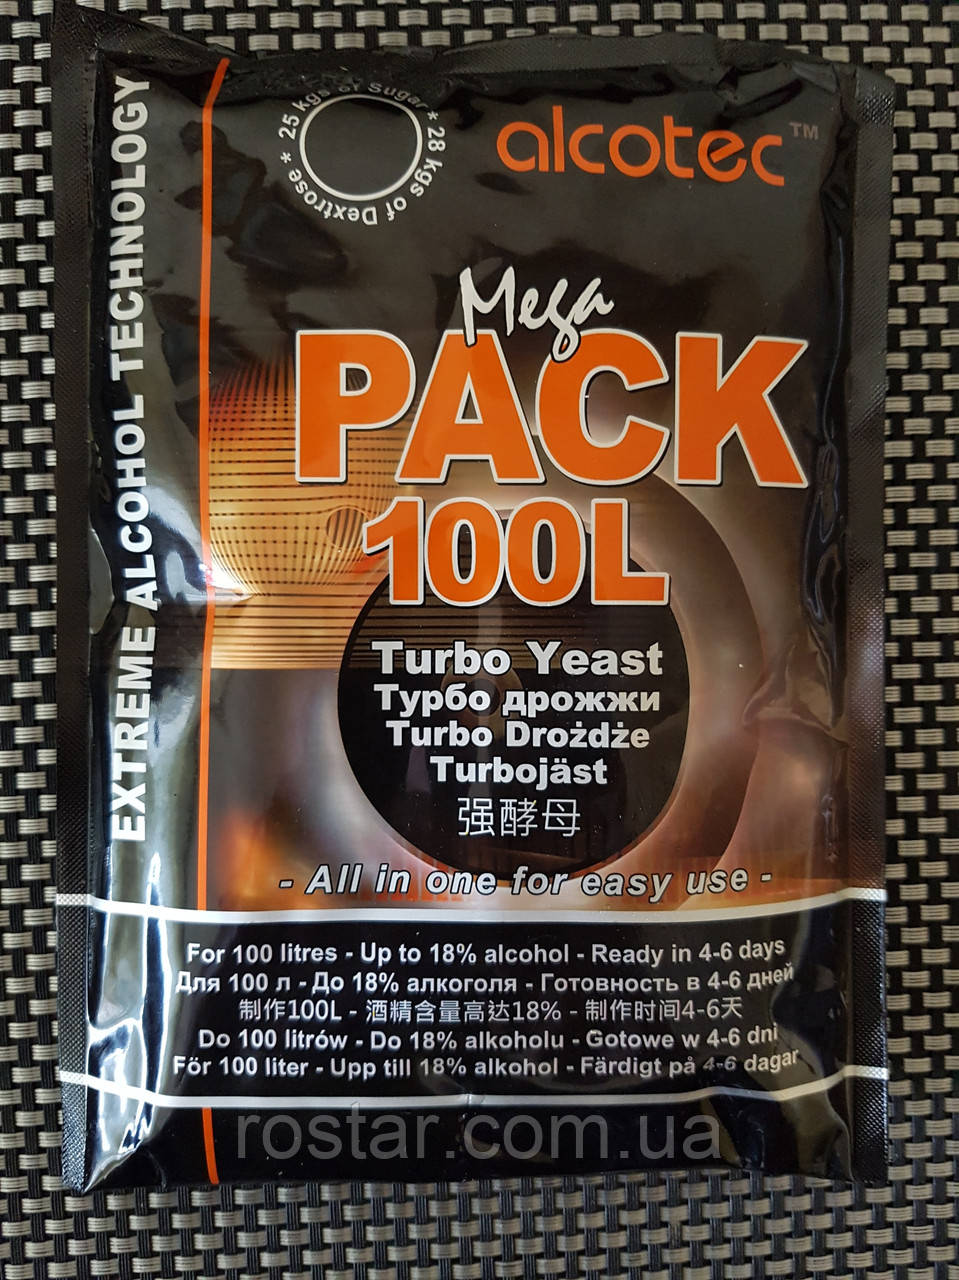 Дріжджі турбоі Alcotec Mega PACK Turbo Yeast 100l 360г.